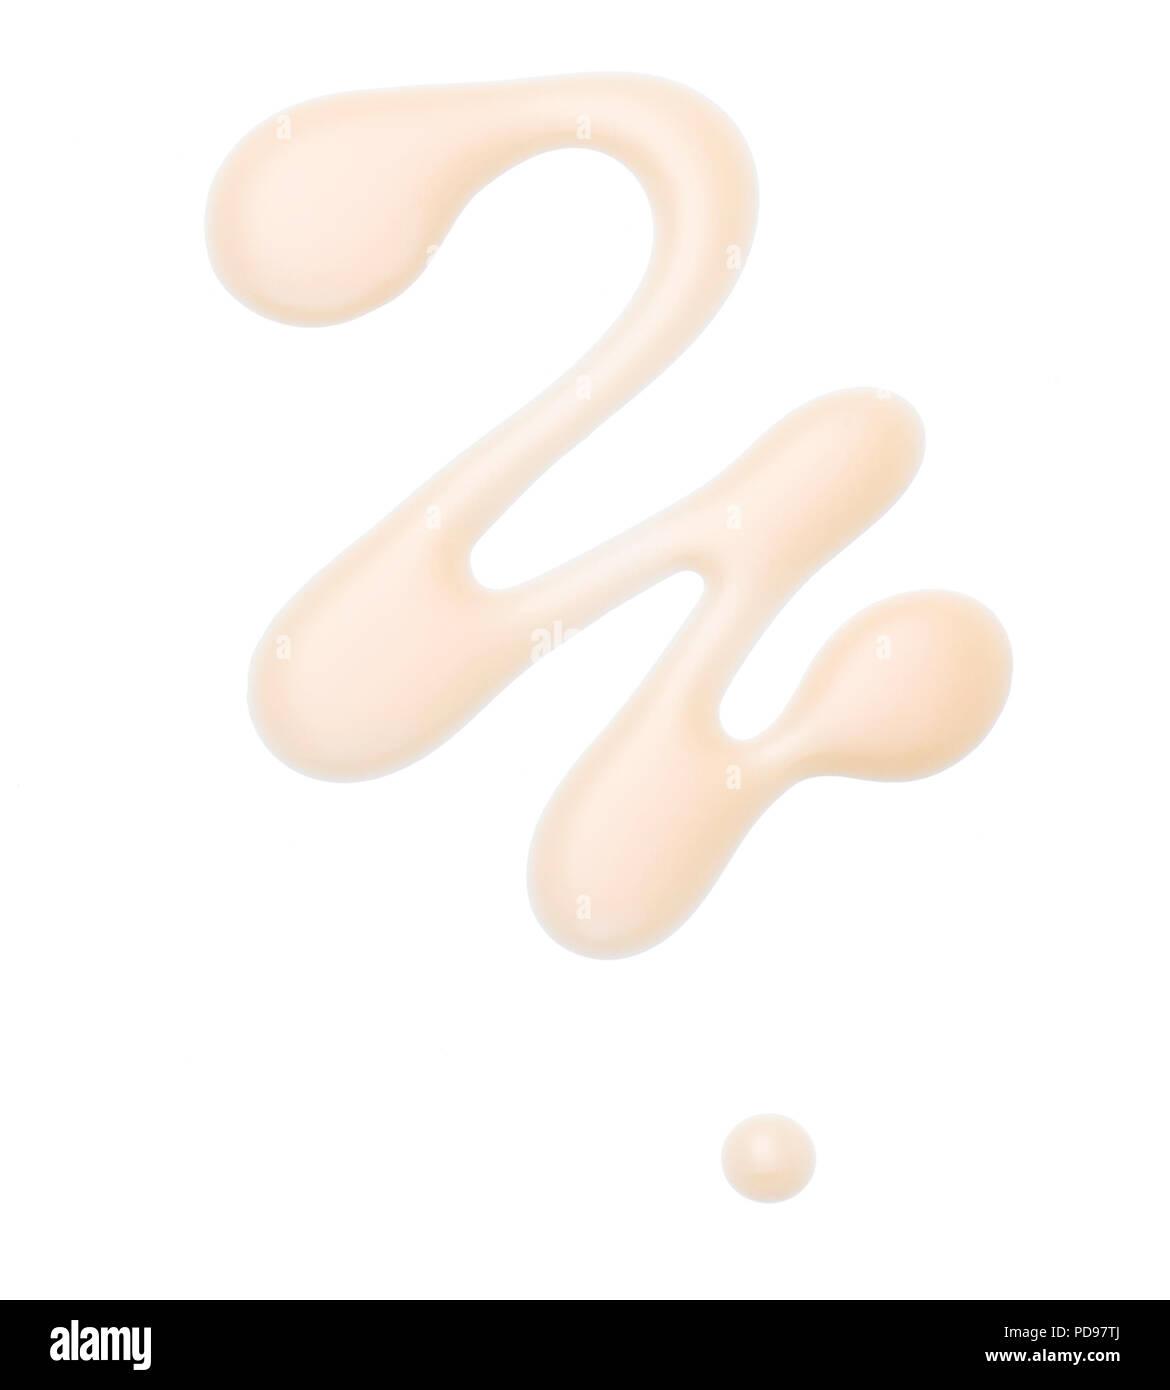 Liquid blush spill - Stock Image